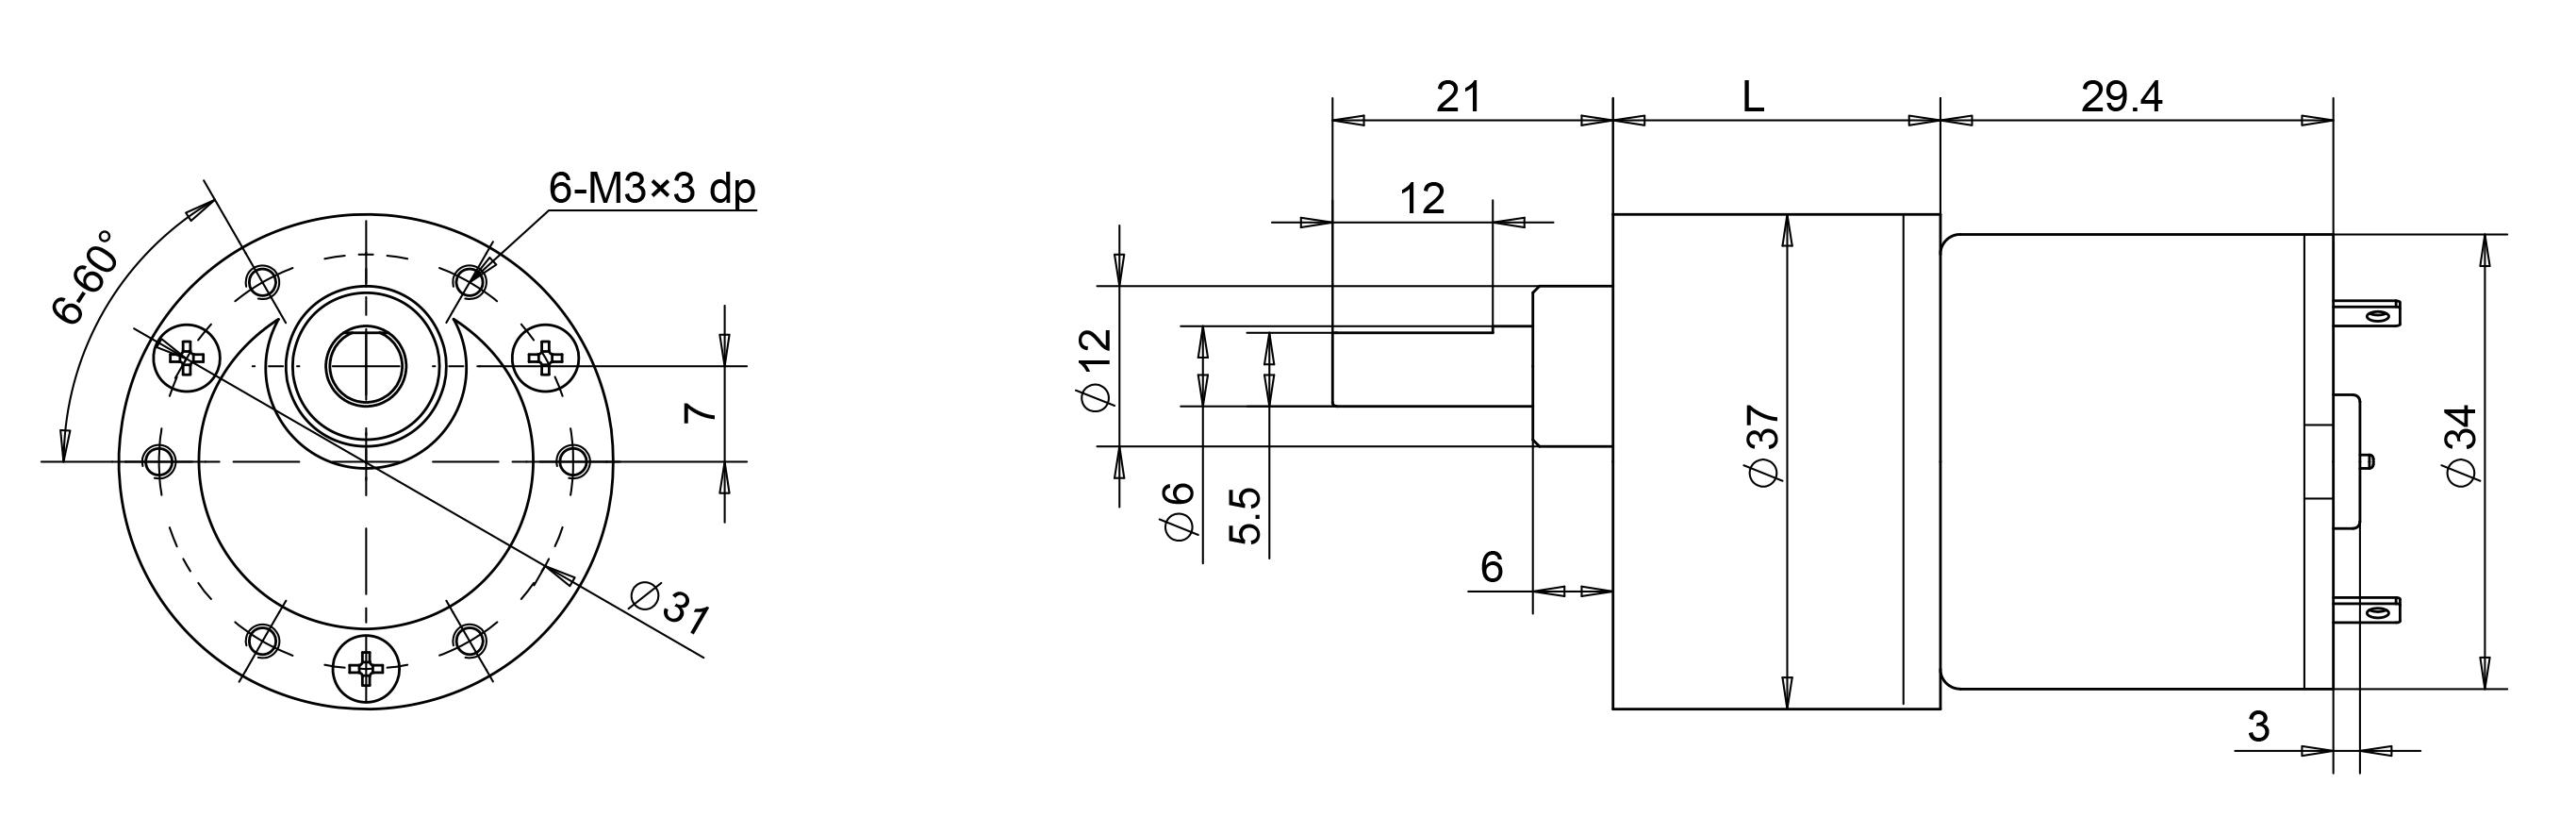 gearmotor drawing